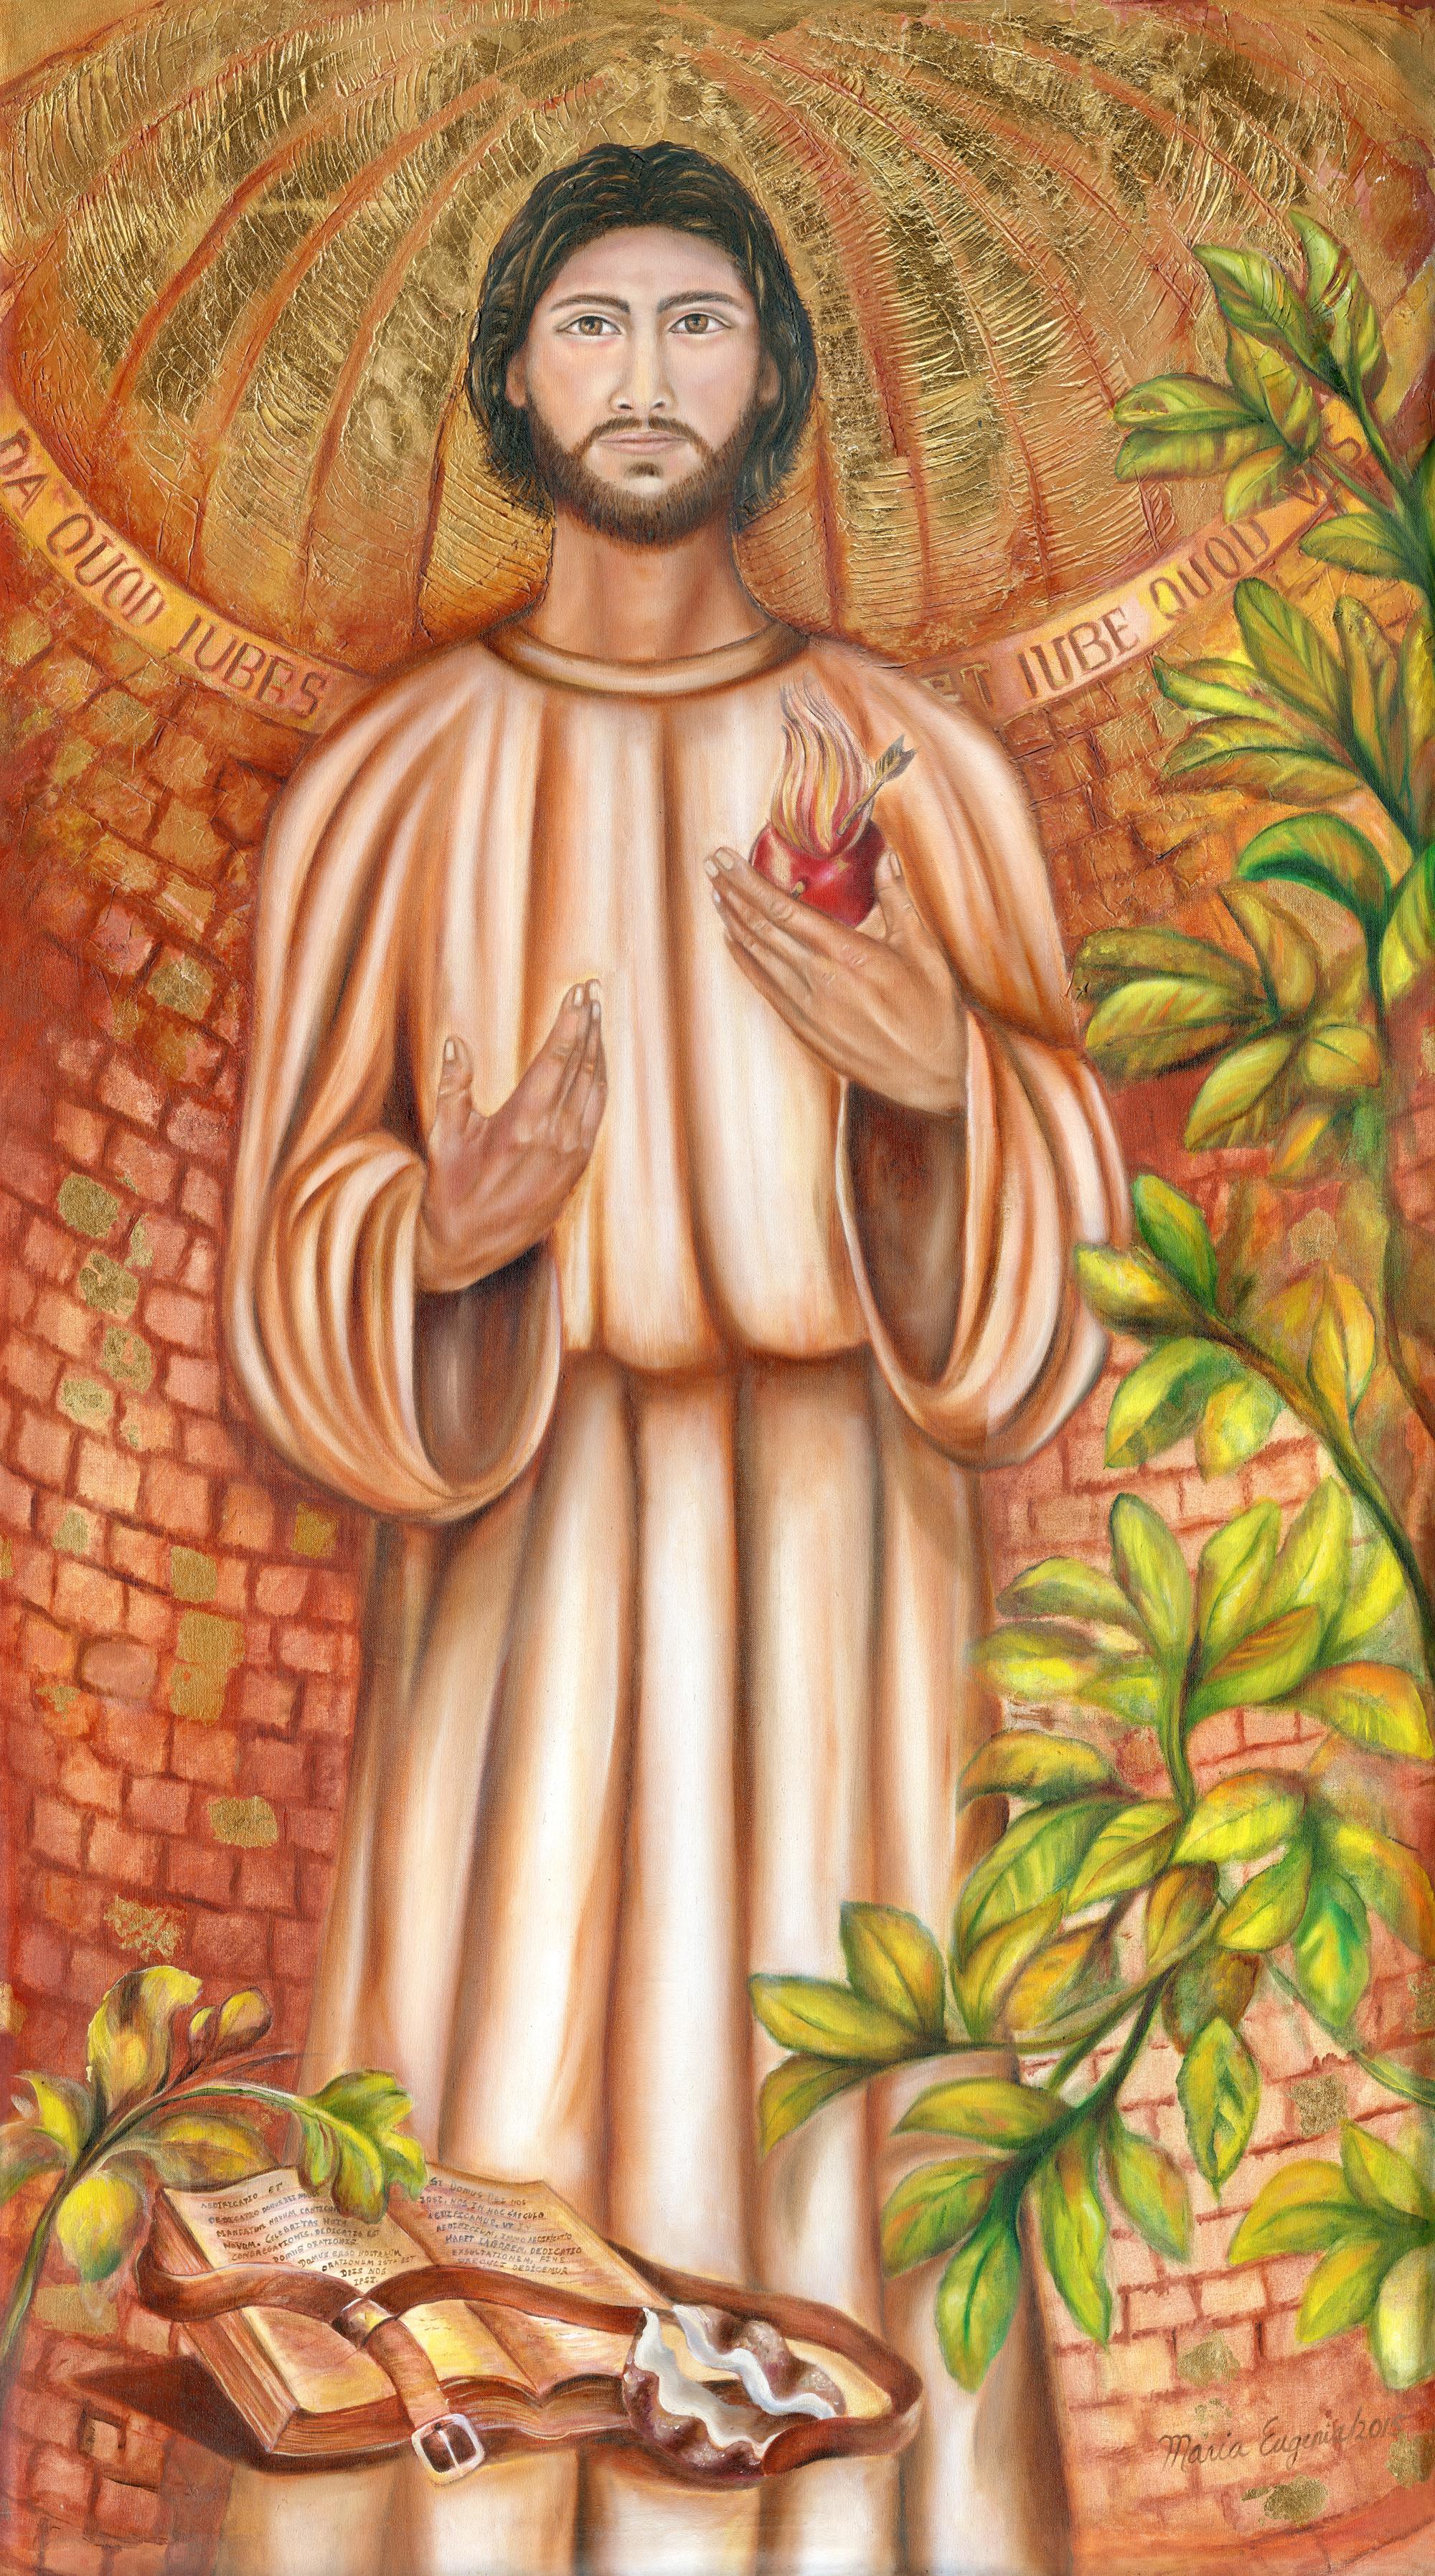 Saint Augustine, by Maria Eugenia Gutiérrez. Pozos de Santa Ana, San José, Costa Rica.